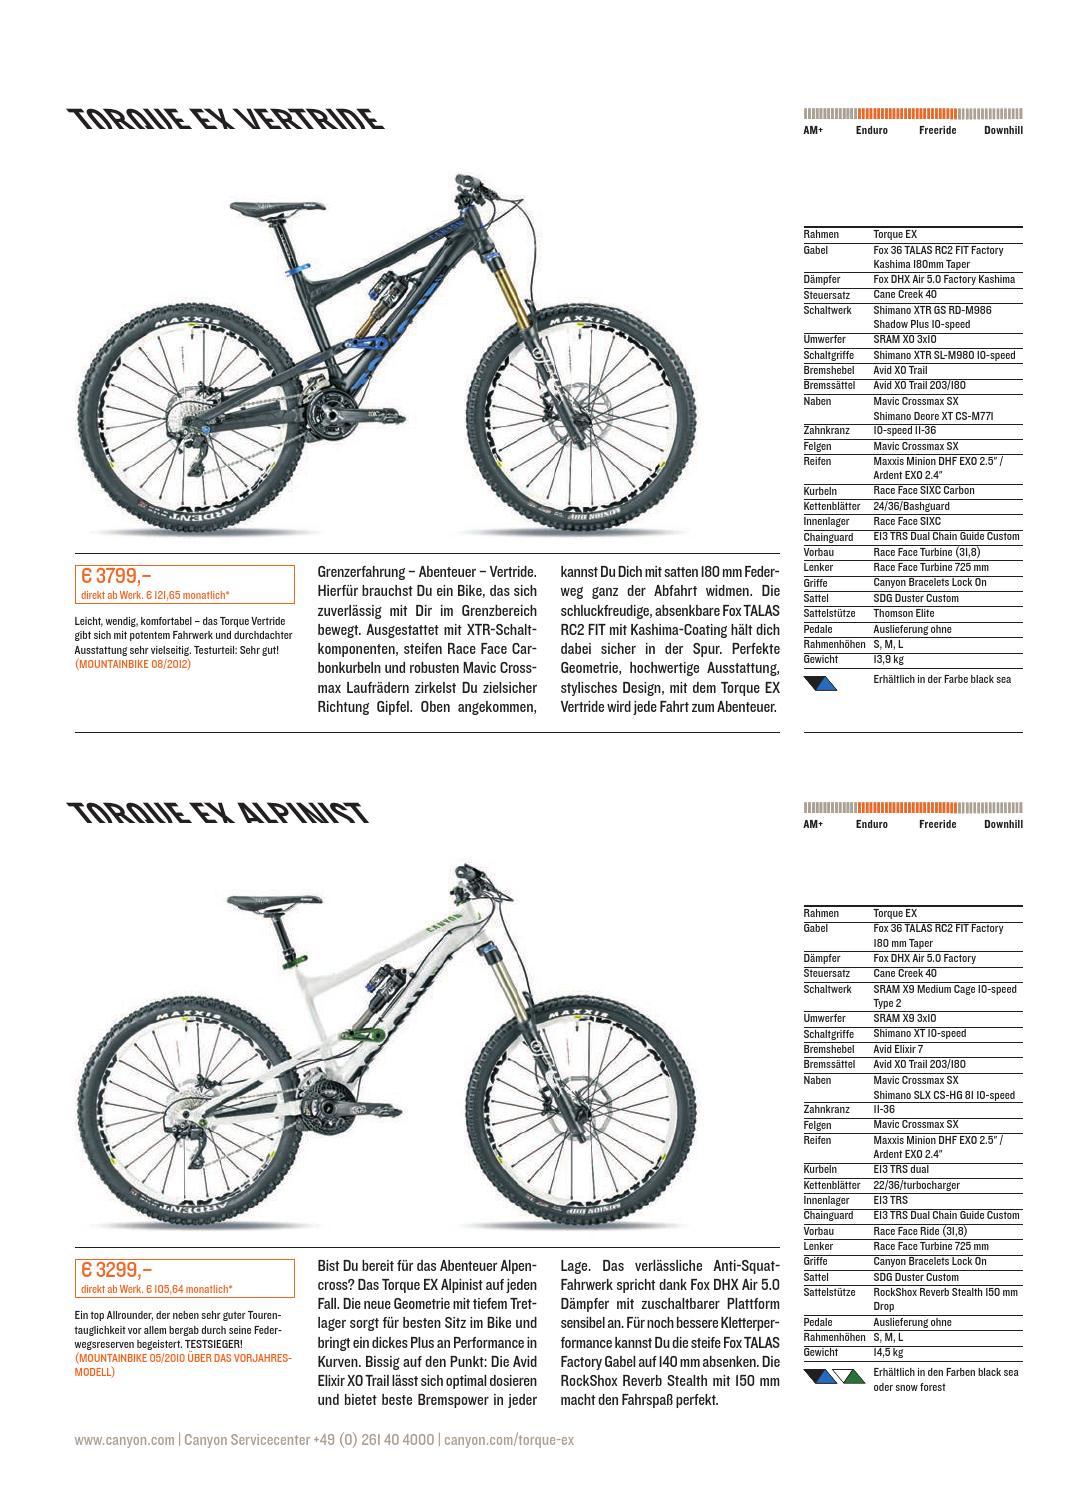 Canyon Mountainbike Katalog 2013 by Canyon Bicycles GmbH